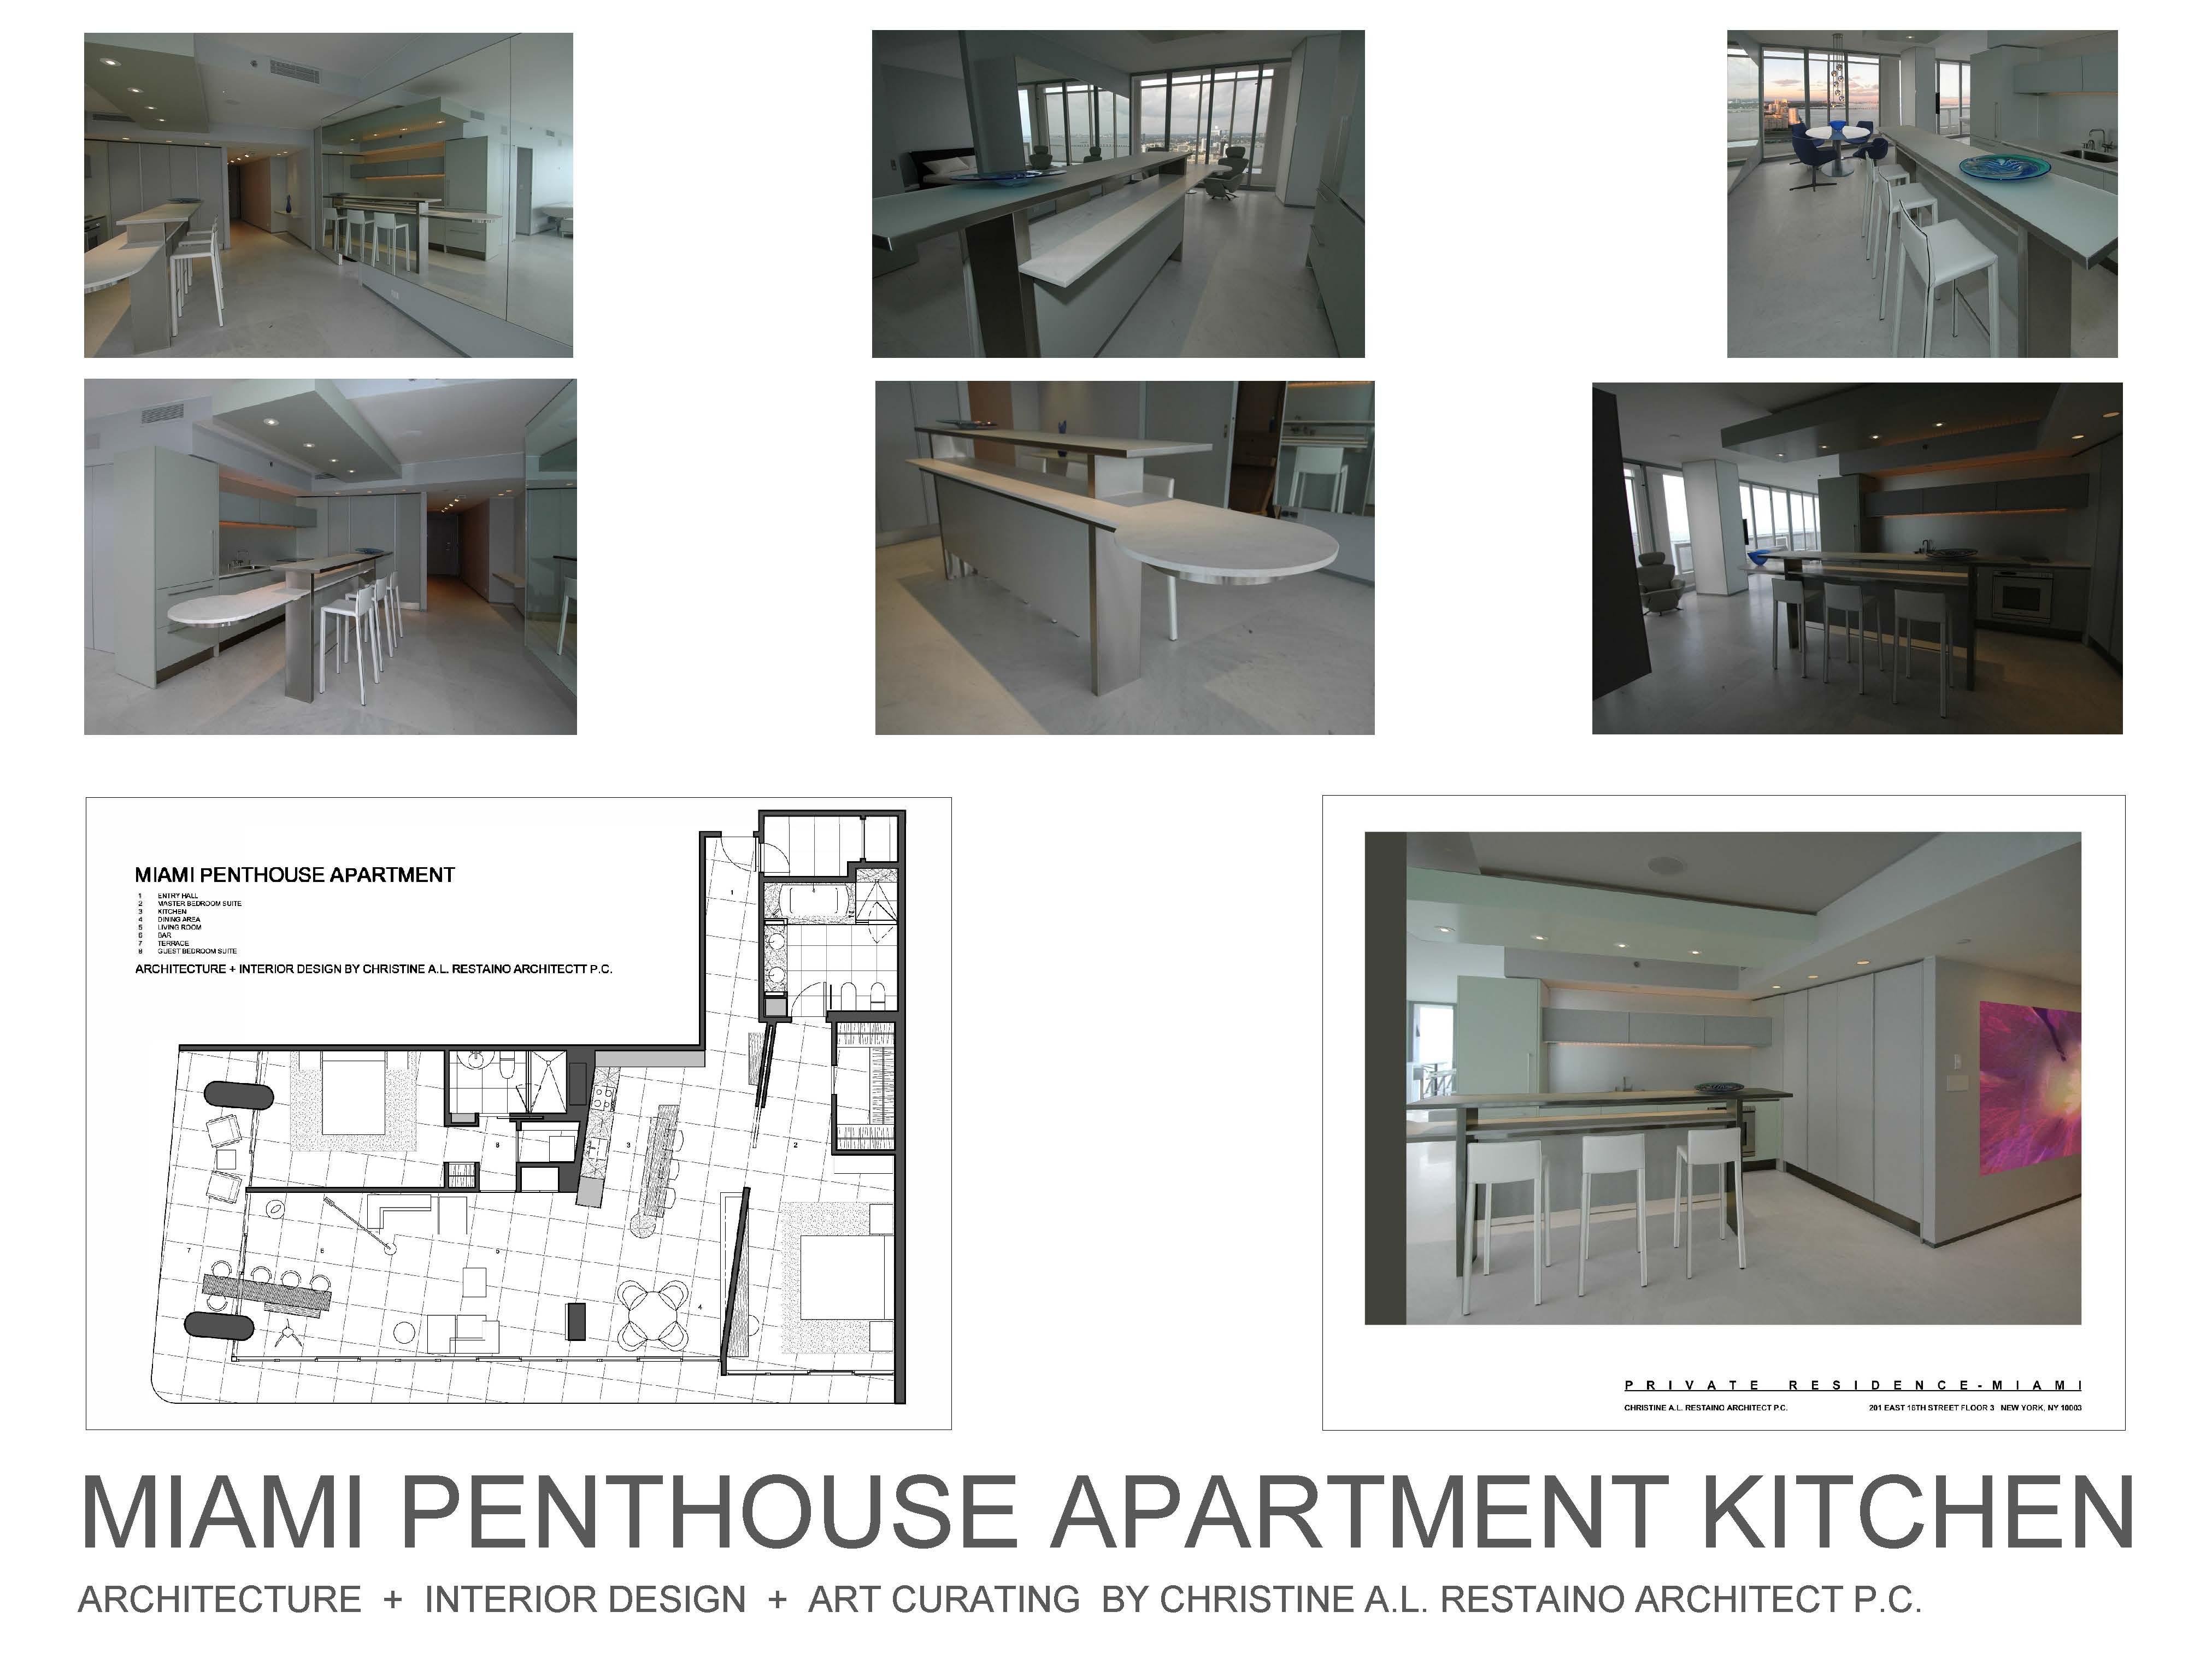 Miami Penthouse Kitchen - Photo Composite Dan Zaharia + Christine Restaino